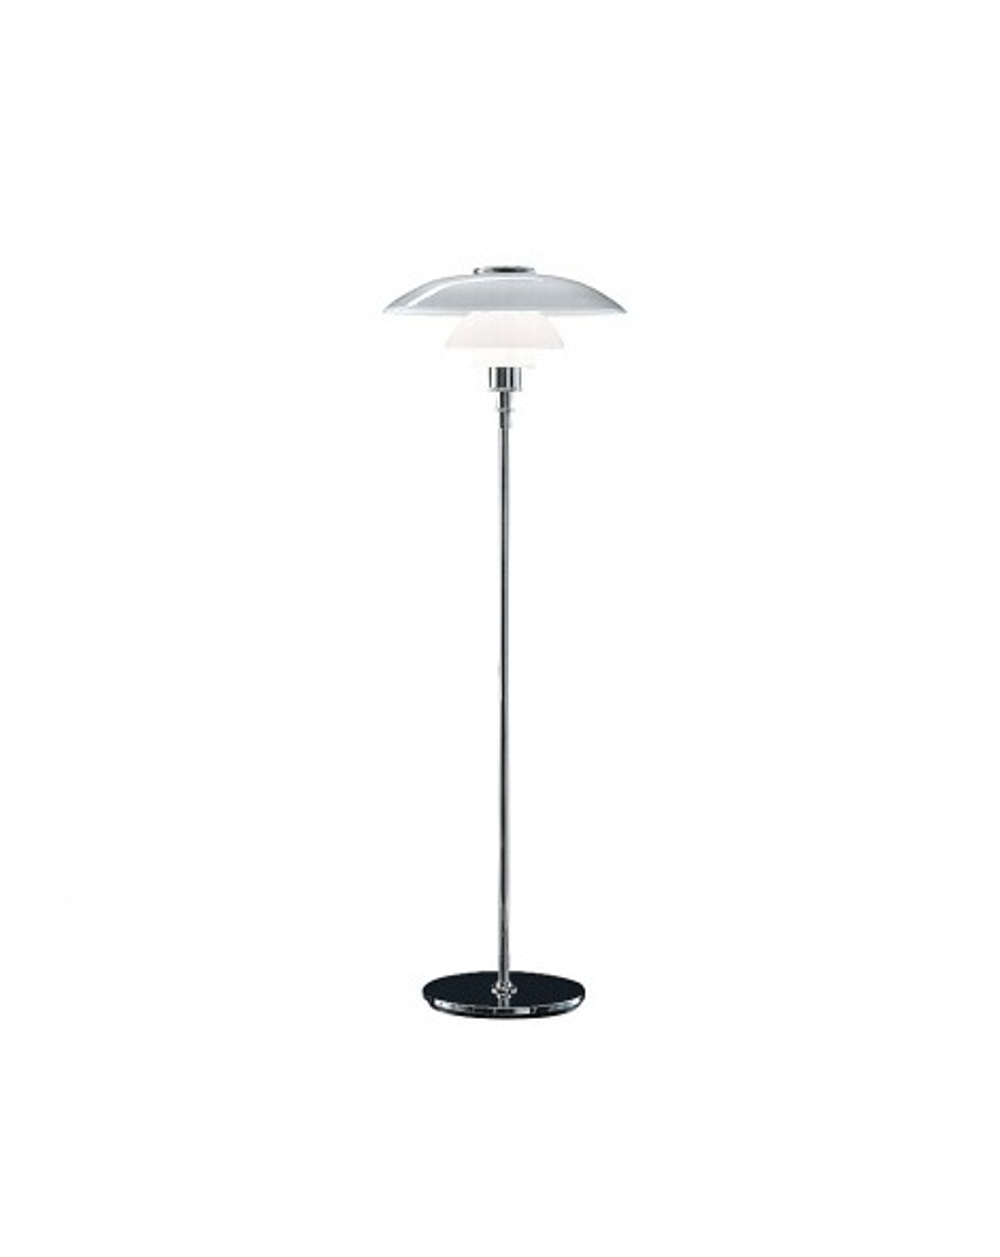 PH 4 ½ - 3 ½ LAMPADAIRE